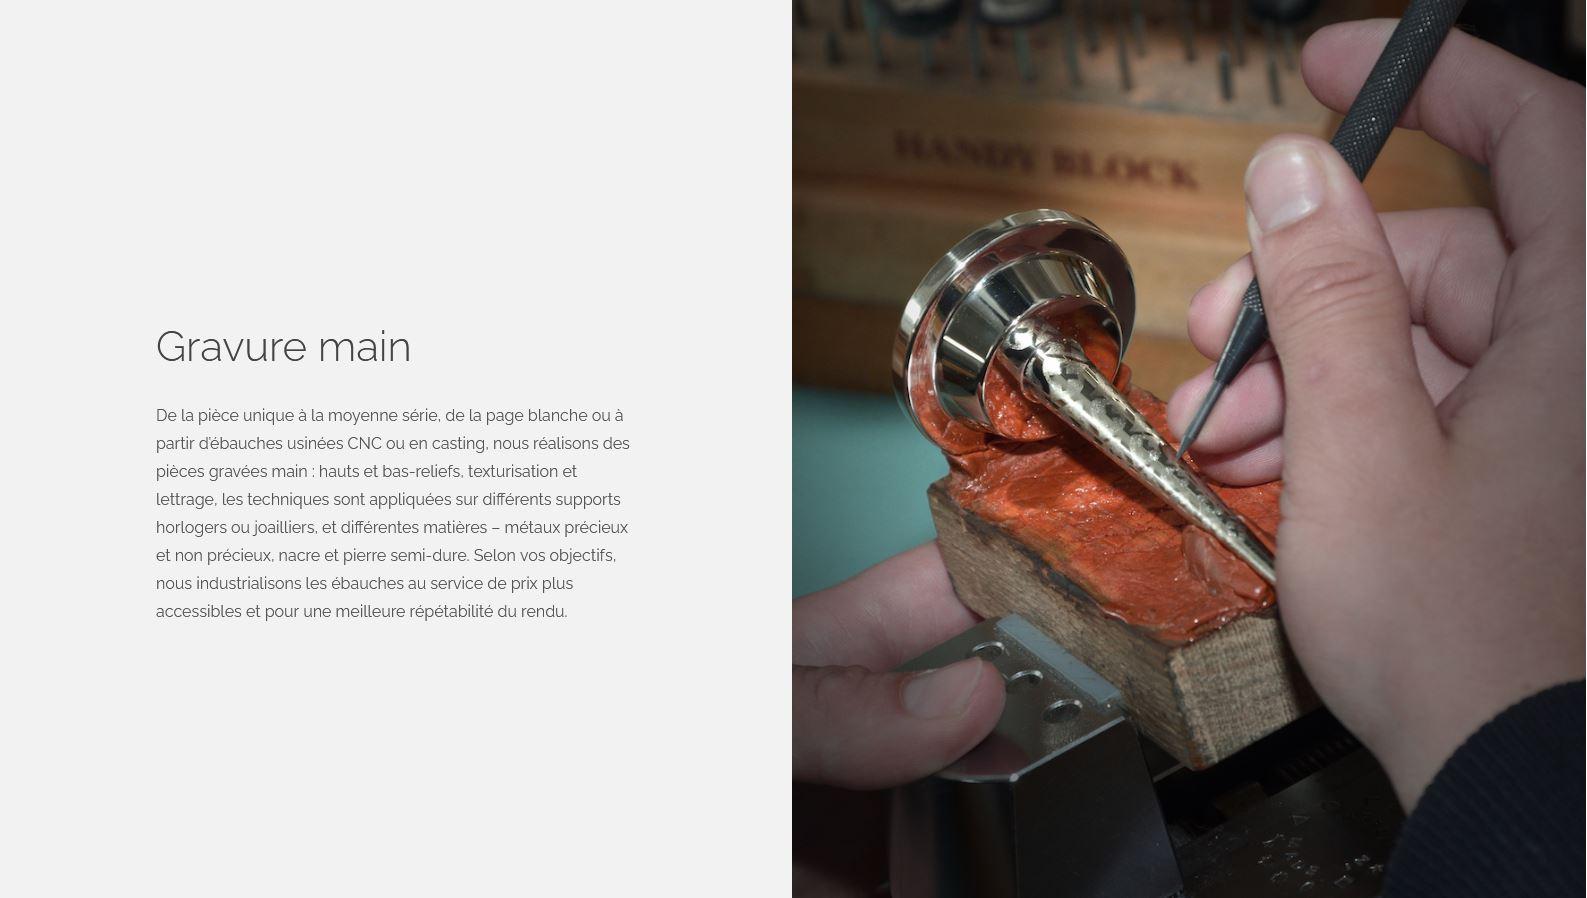 Horlogerie - Mu-Tech - Site internet - Page Gravure main